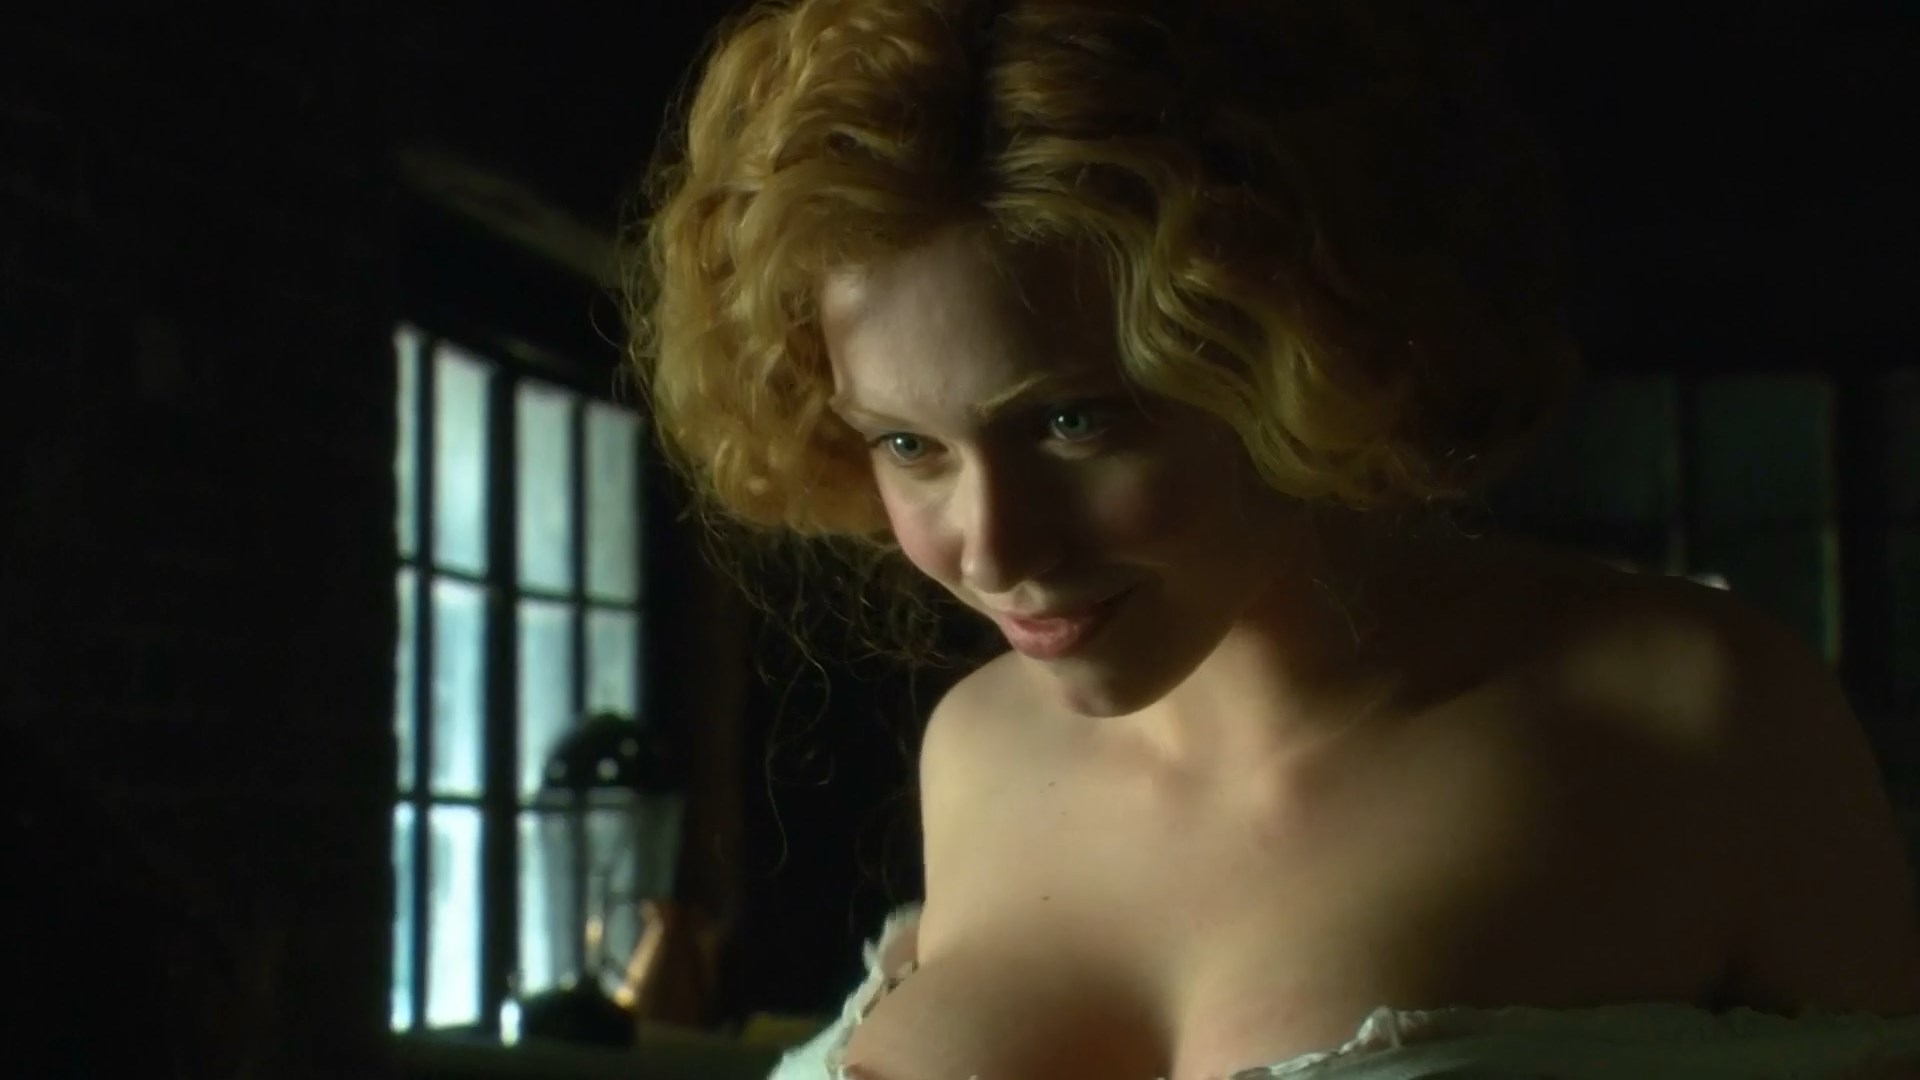 Naked jennie jacques Jennie Jacques